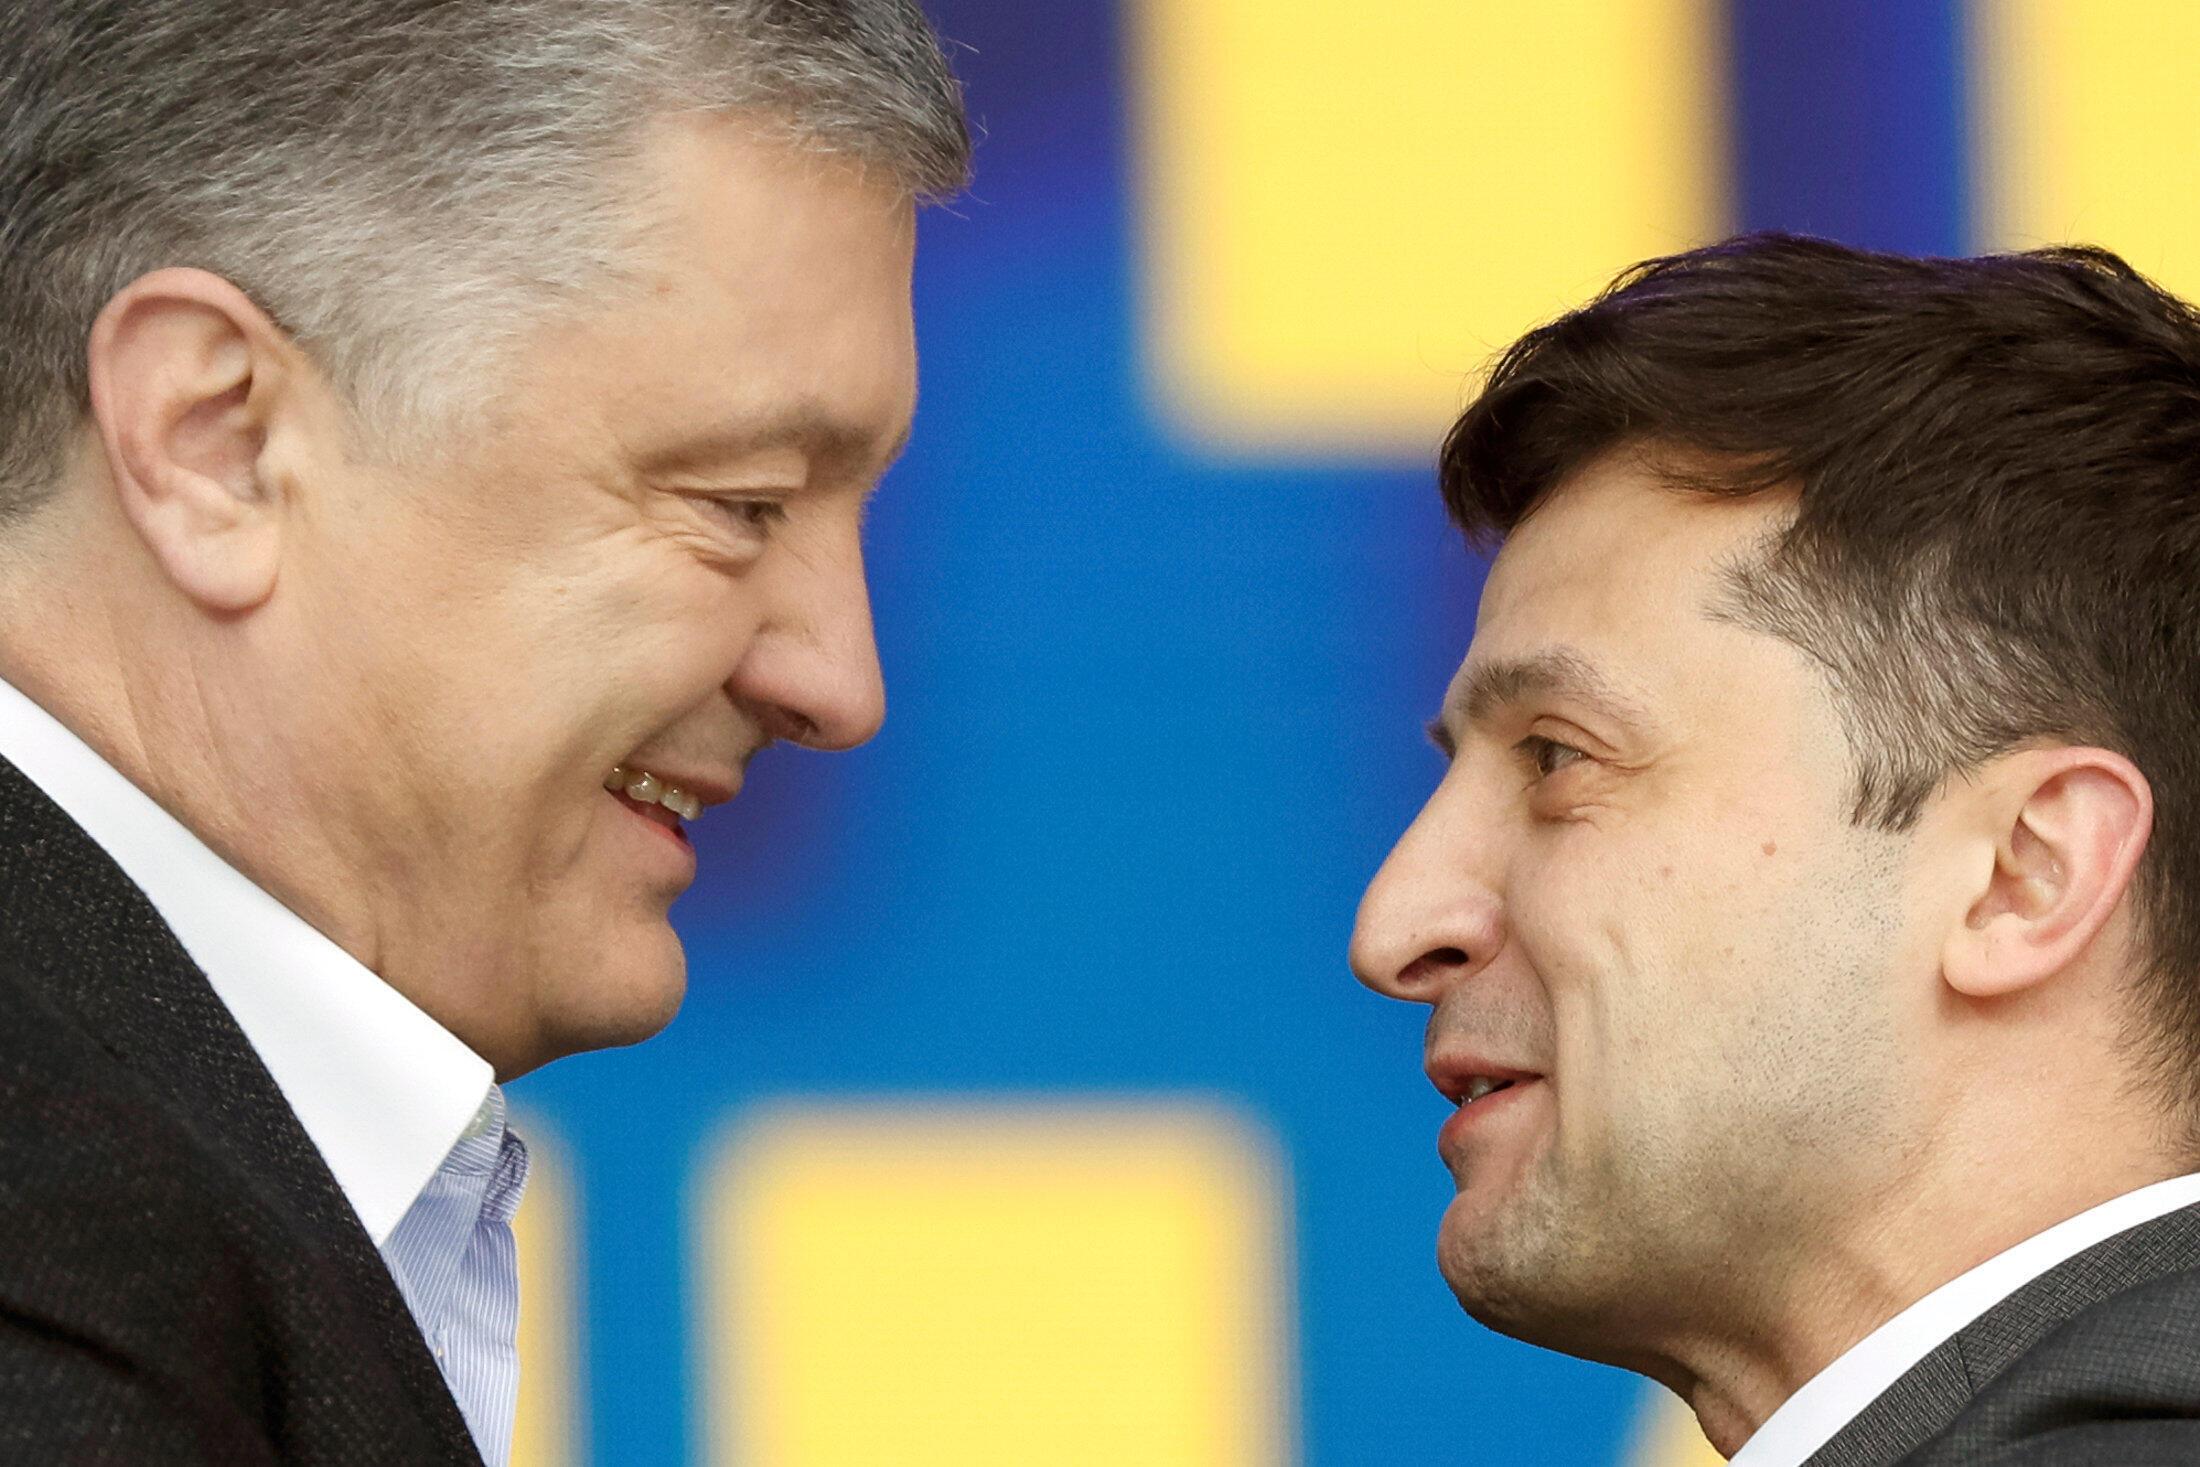 Shugaba Petro Poroshenko mai barin gado tare Volodymyr Zelenskiy shugaban Ukraine mai jiran gado